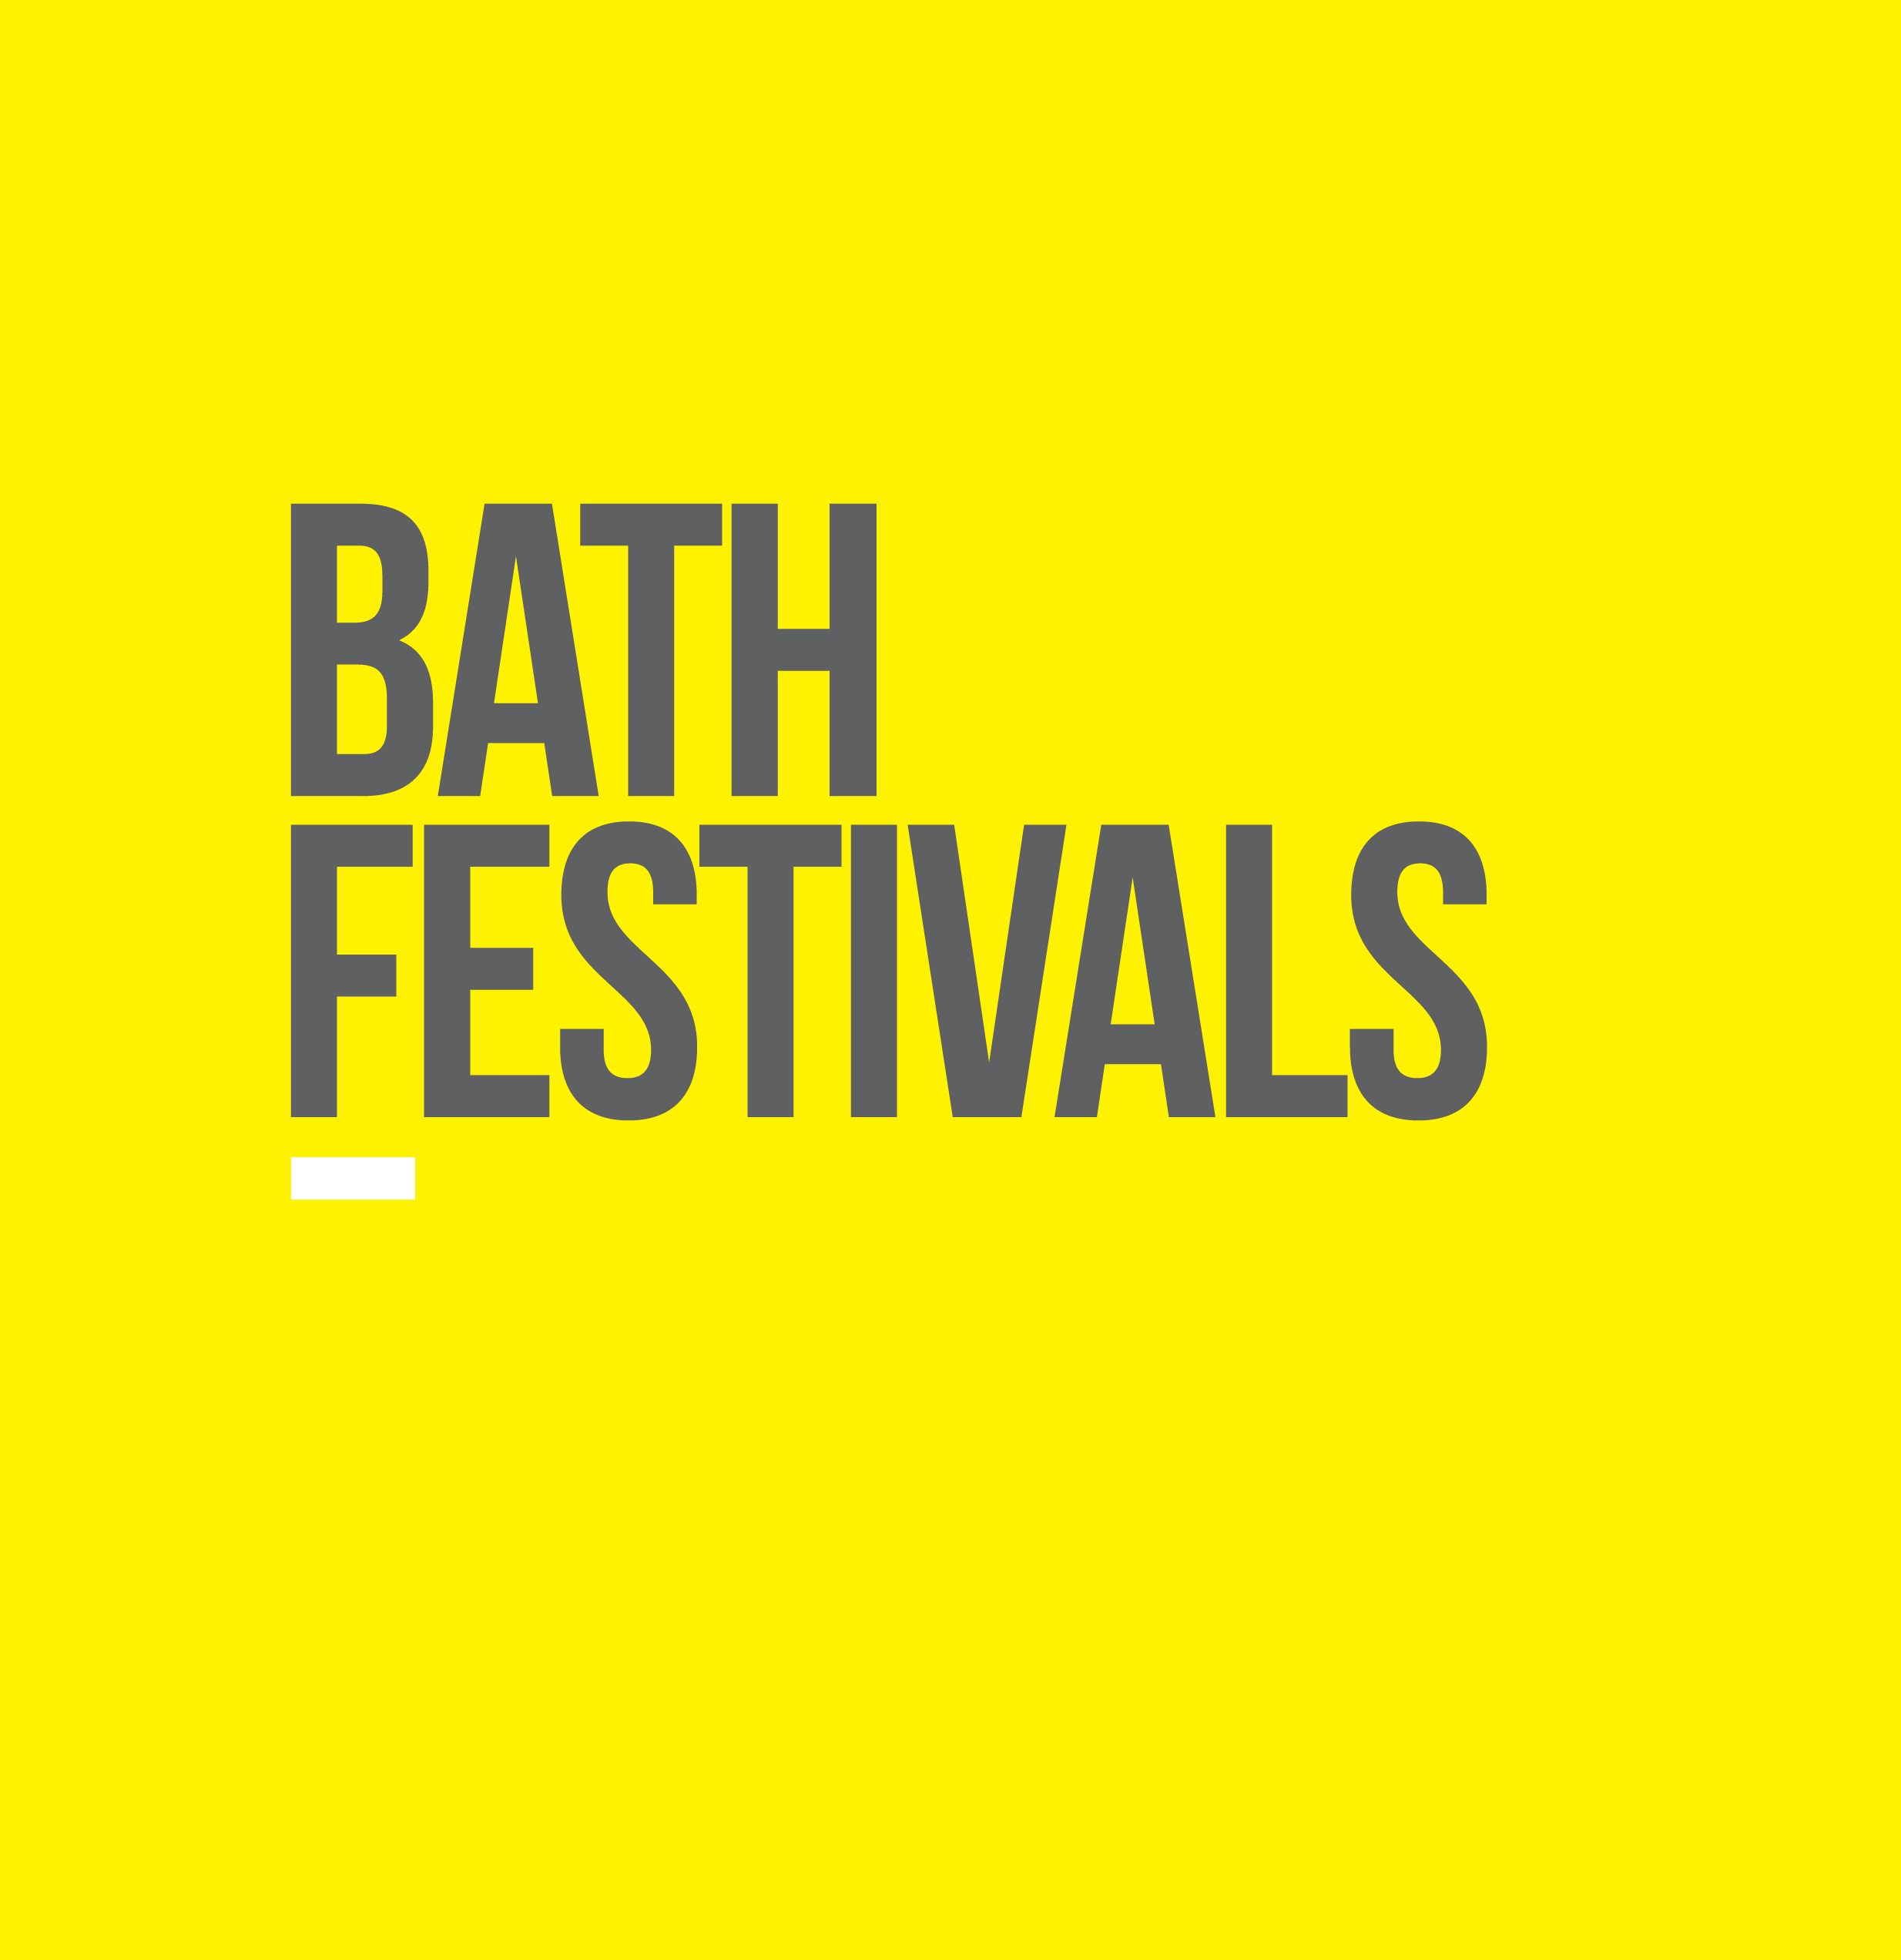 Bath Festivals